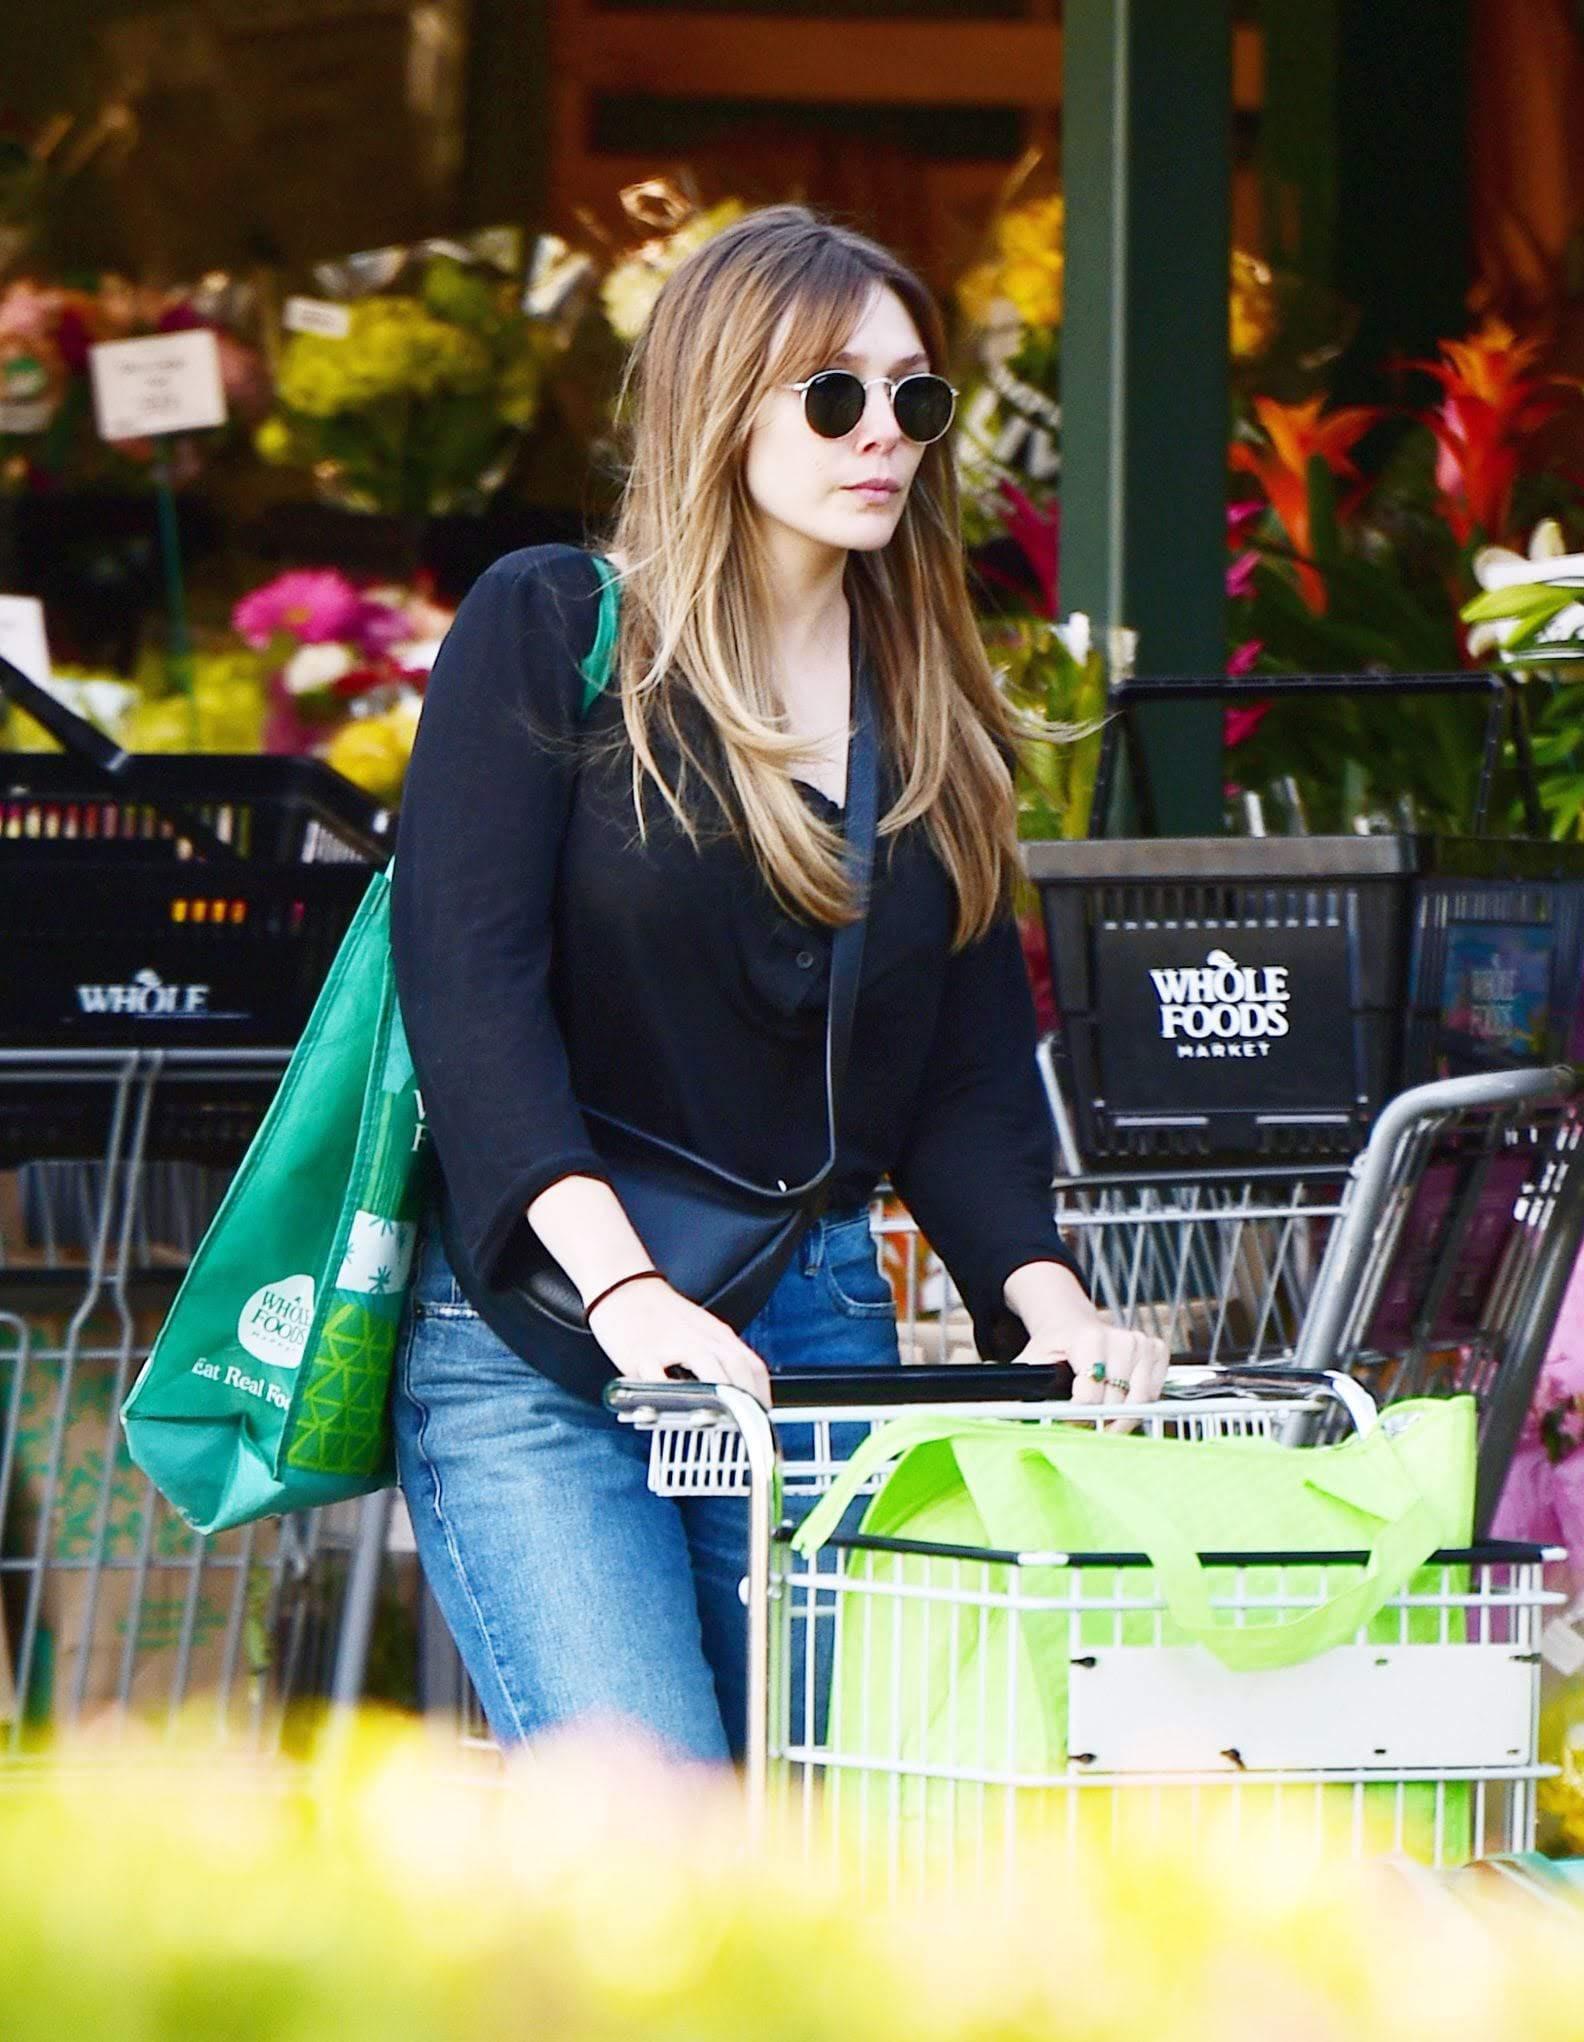 Elizabeth Olsen shopping at Whole Foods : ホール・フーズでお買い物のエリザベス・オルセン ! !